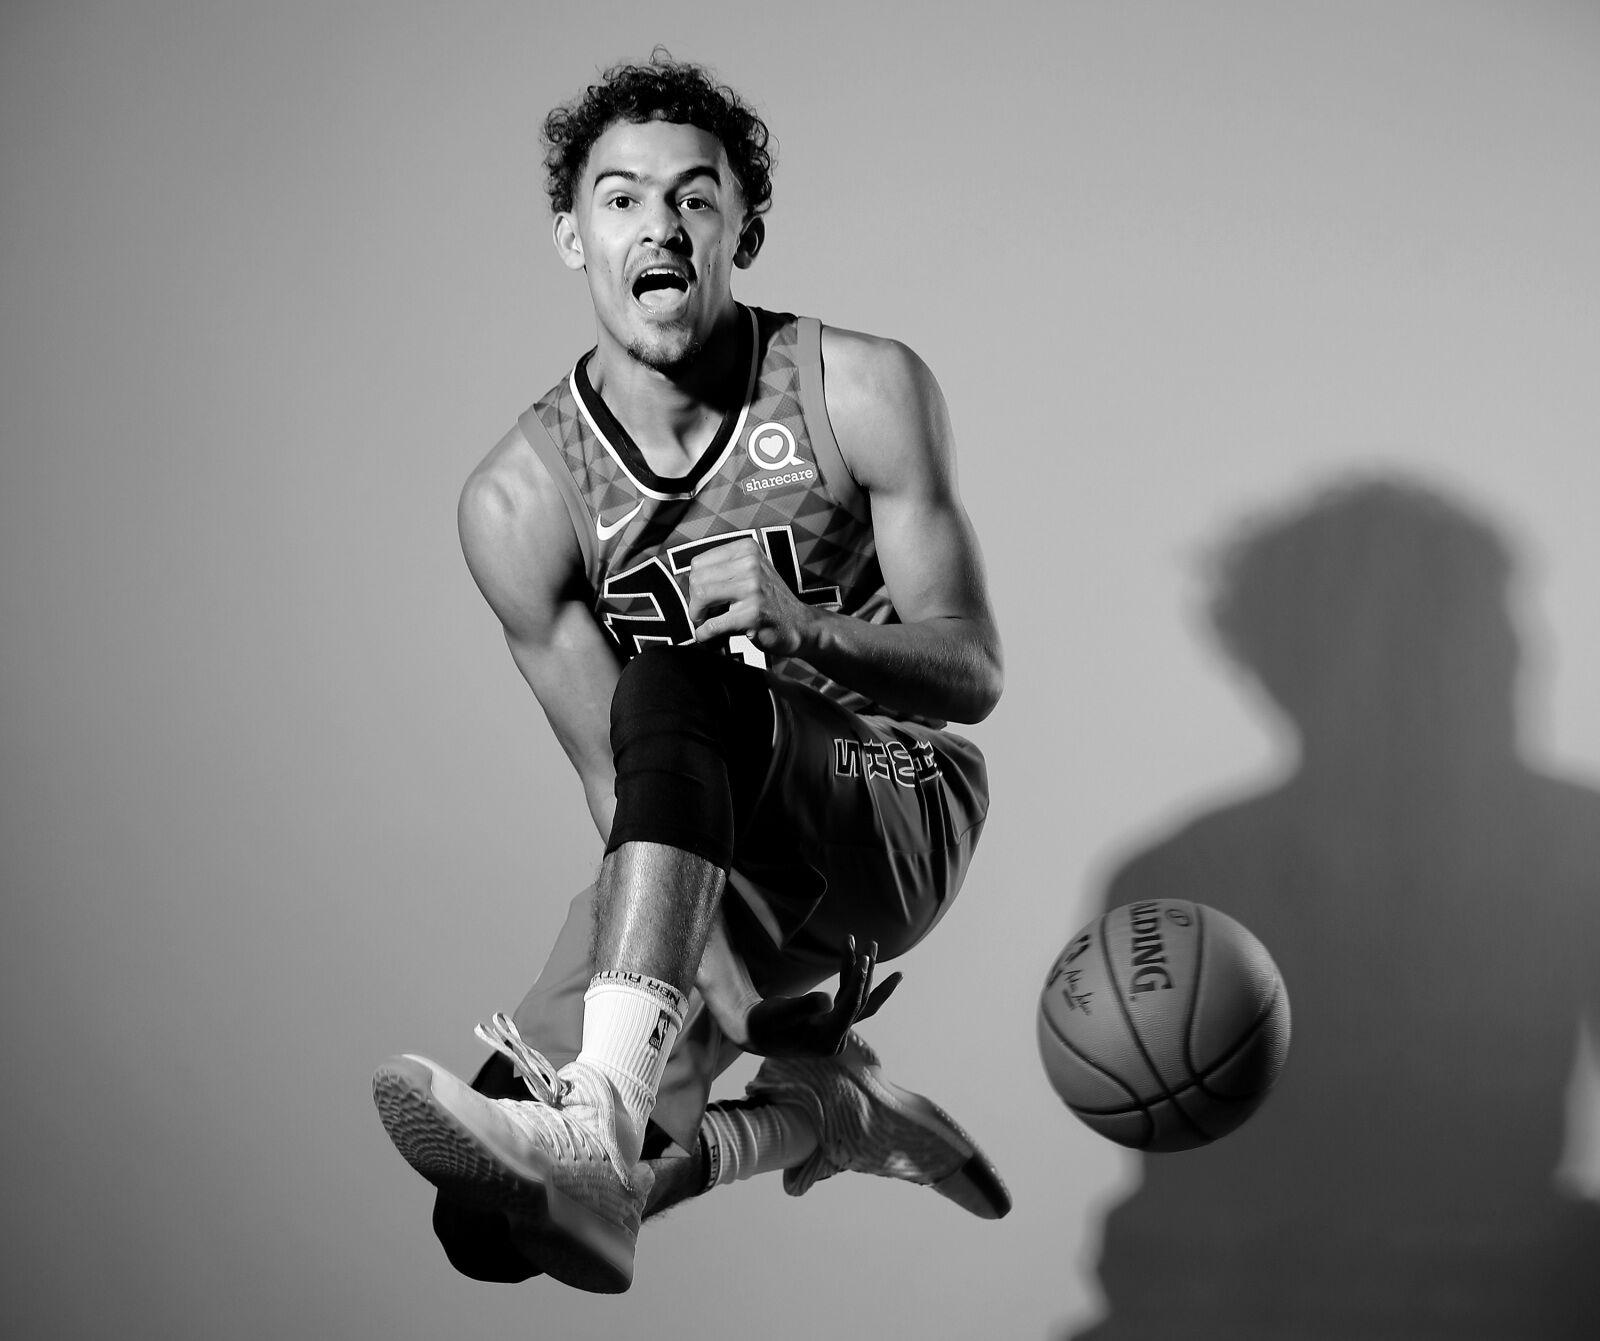 Atlanta Hawks: Trae Young's NBA 2K19 Rating Revealed